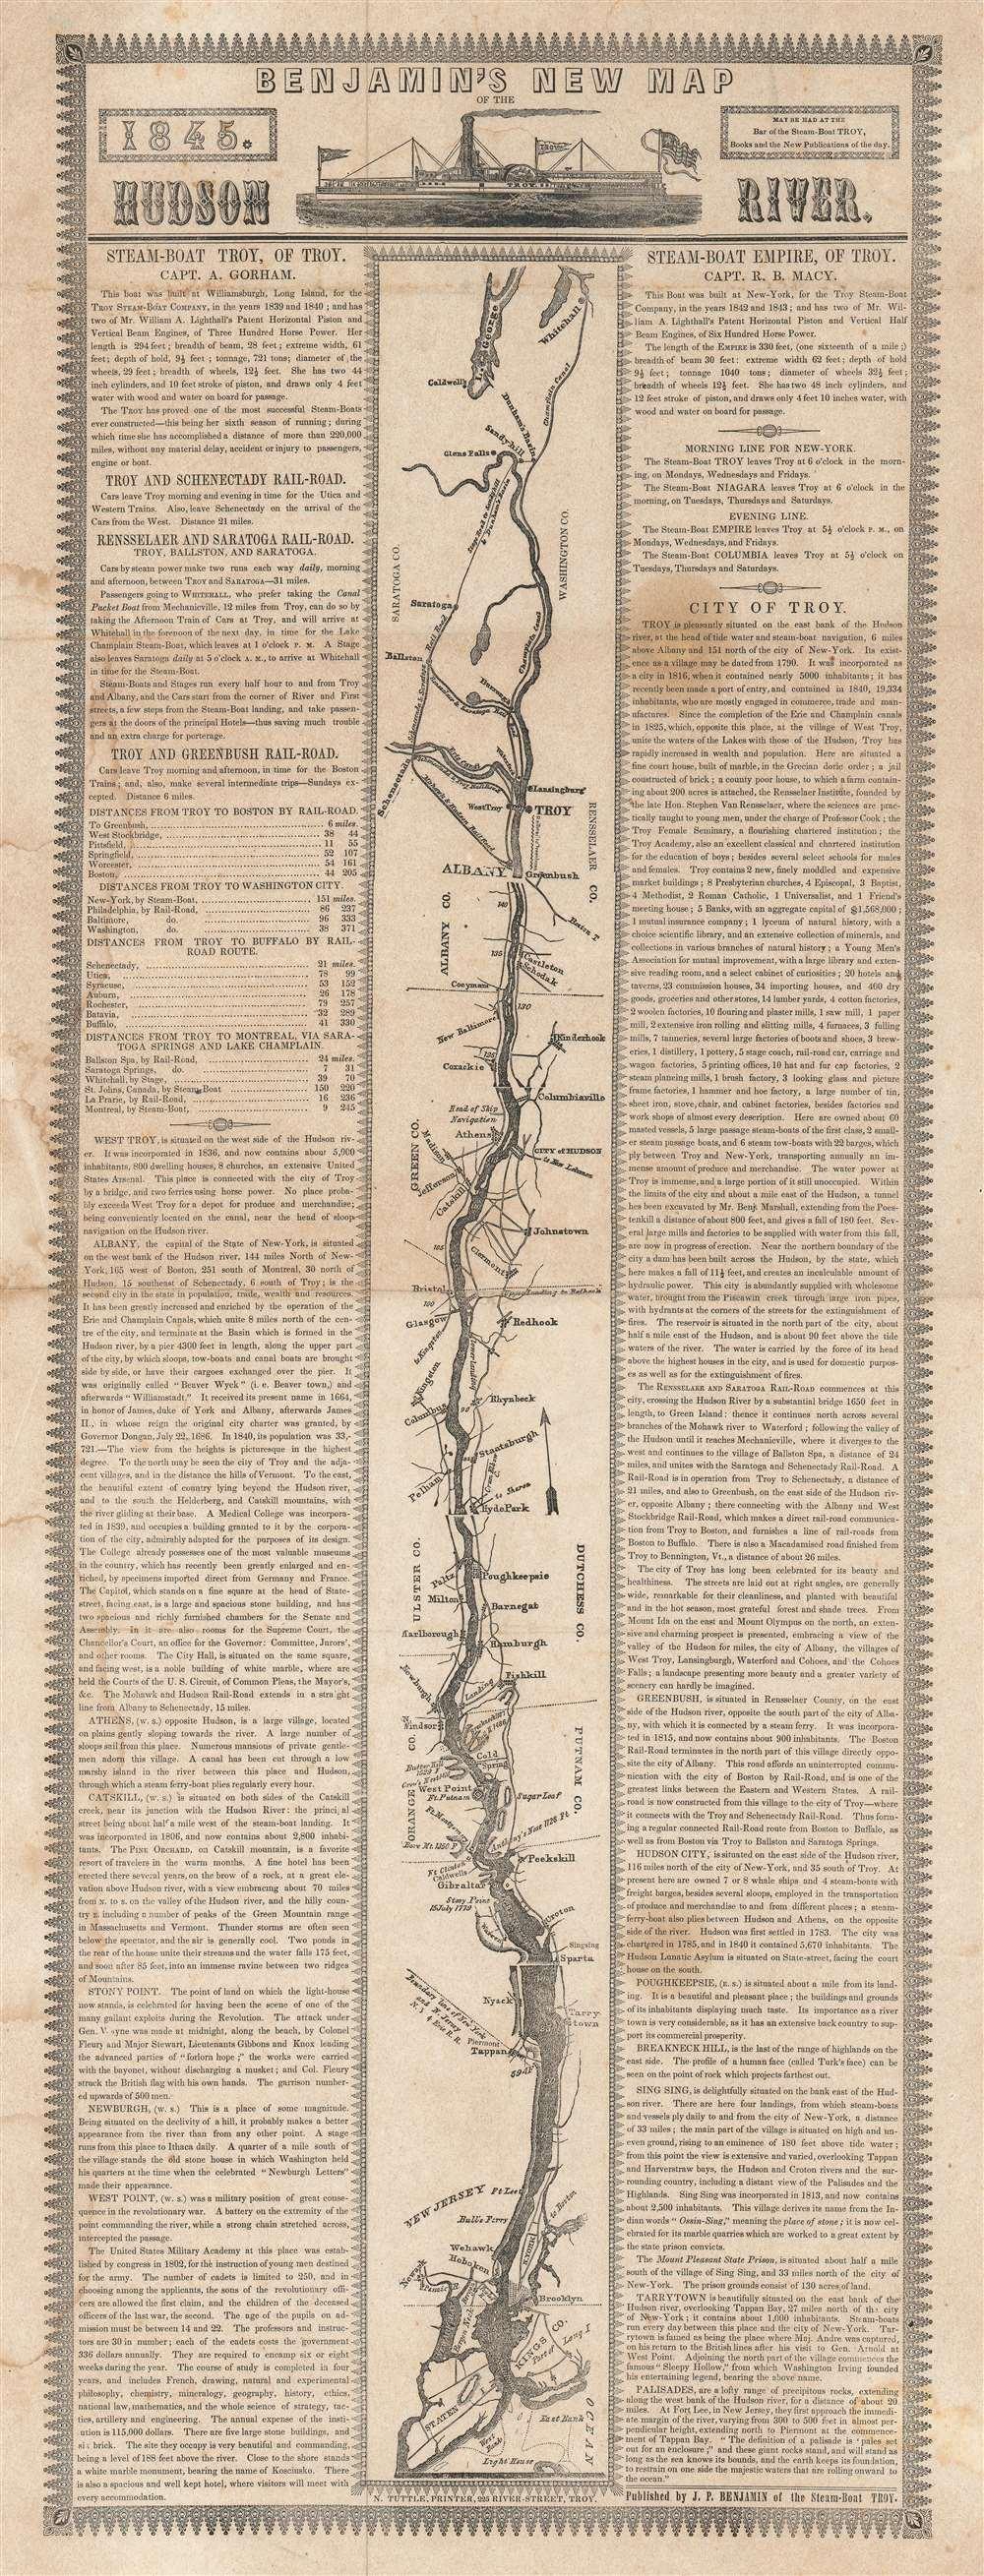 Benjamin's New Map of the Hudson River. - Main View